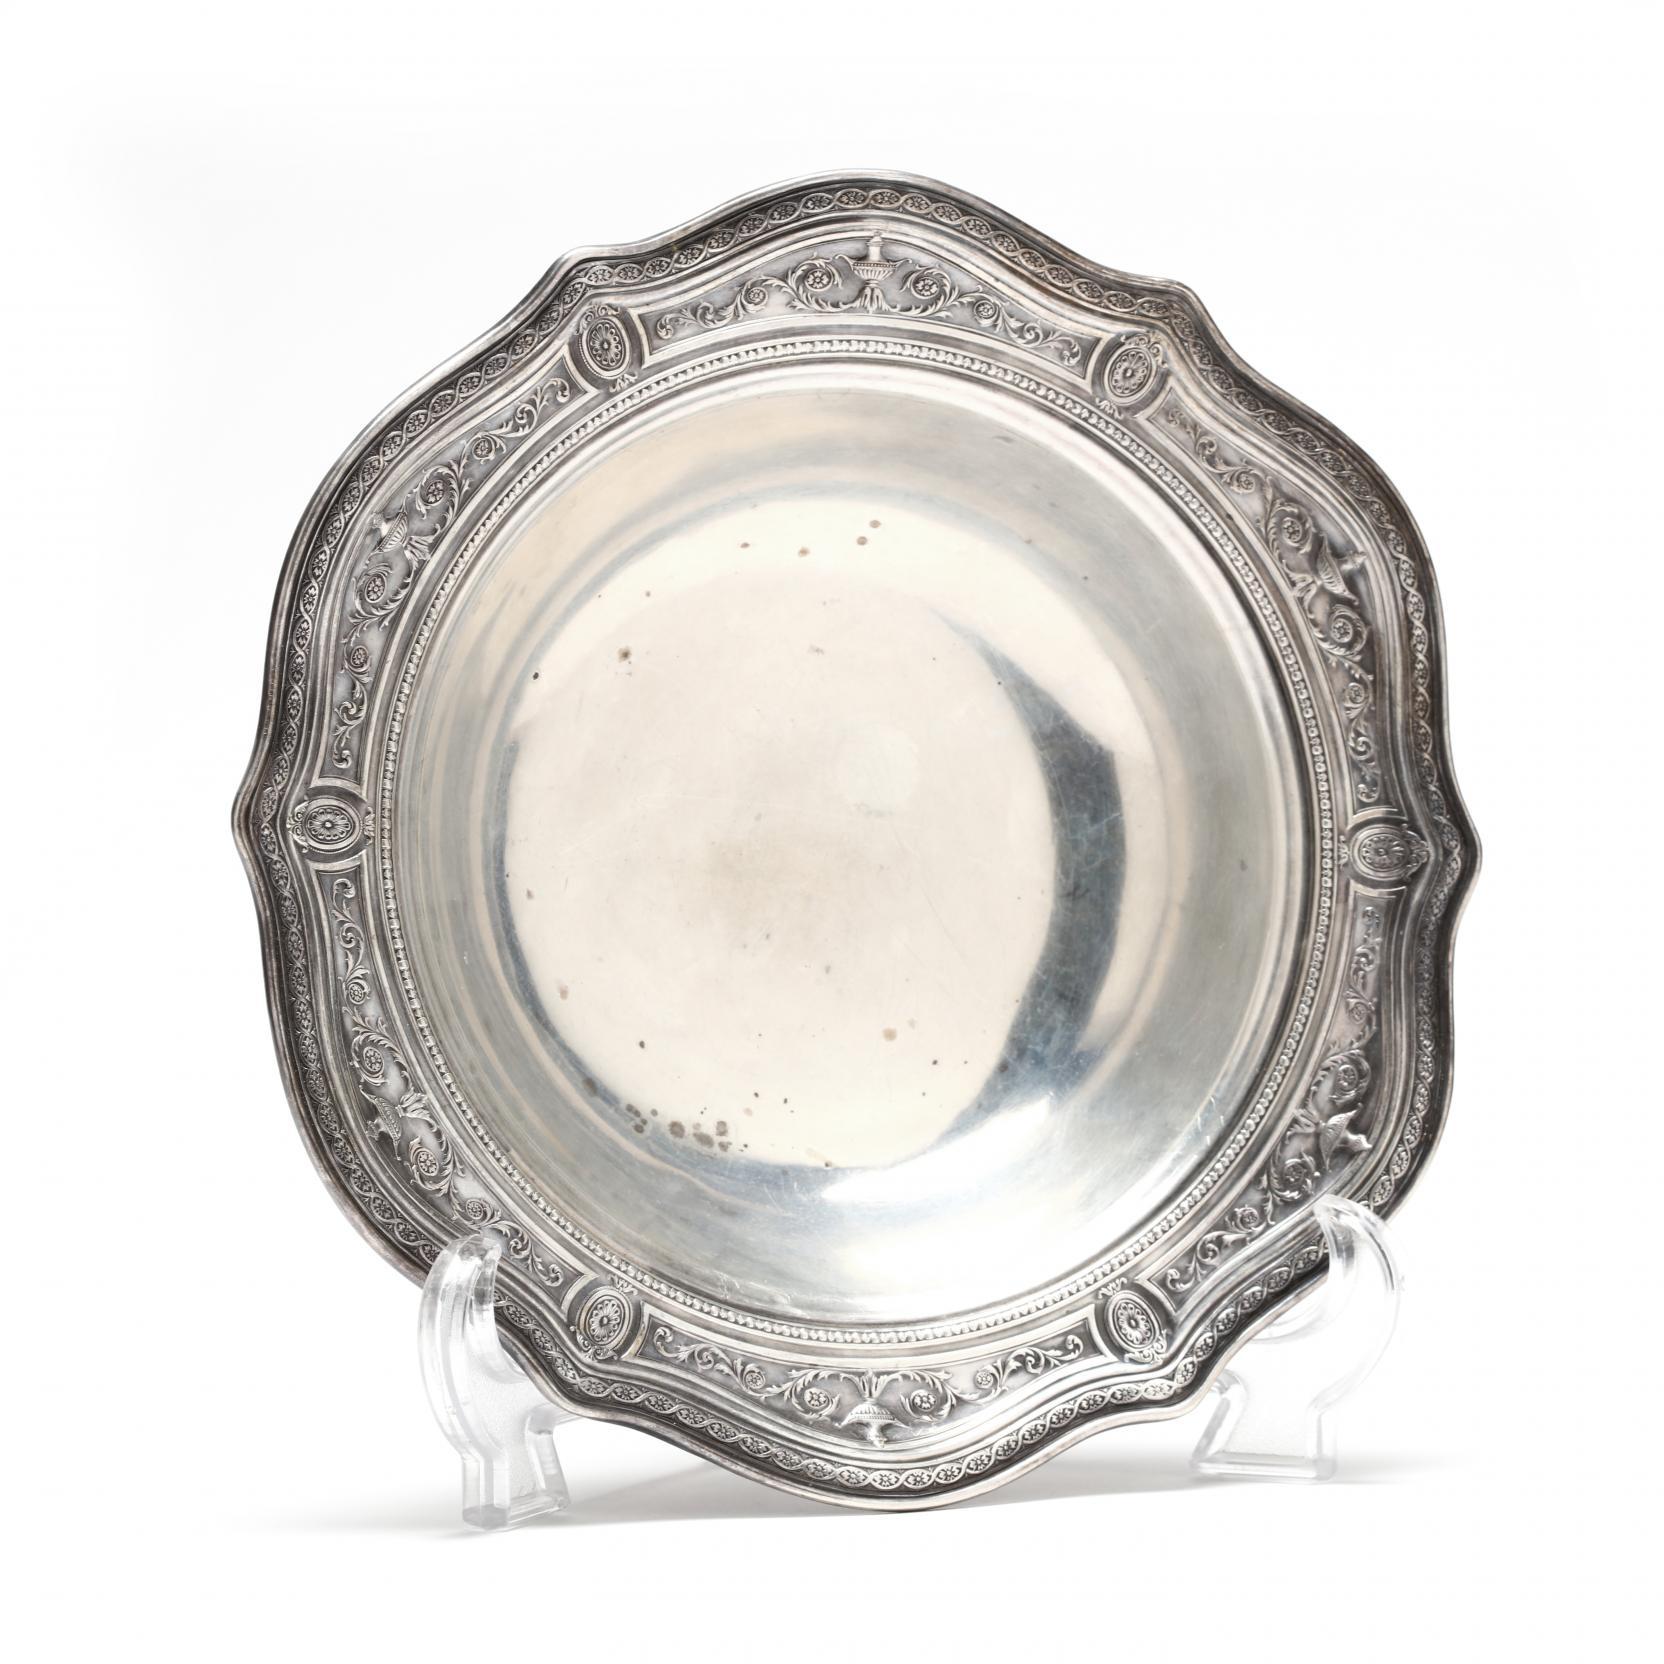 international-sterling-silver-center-bowl